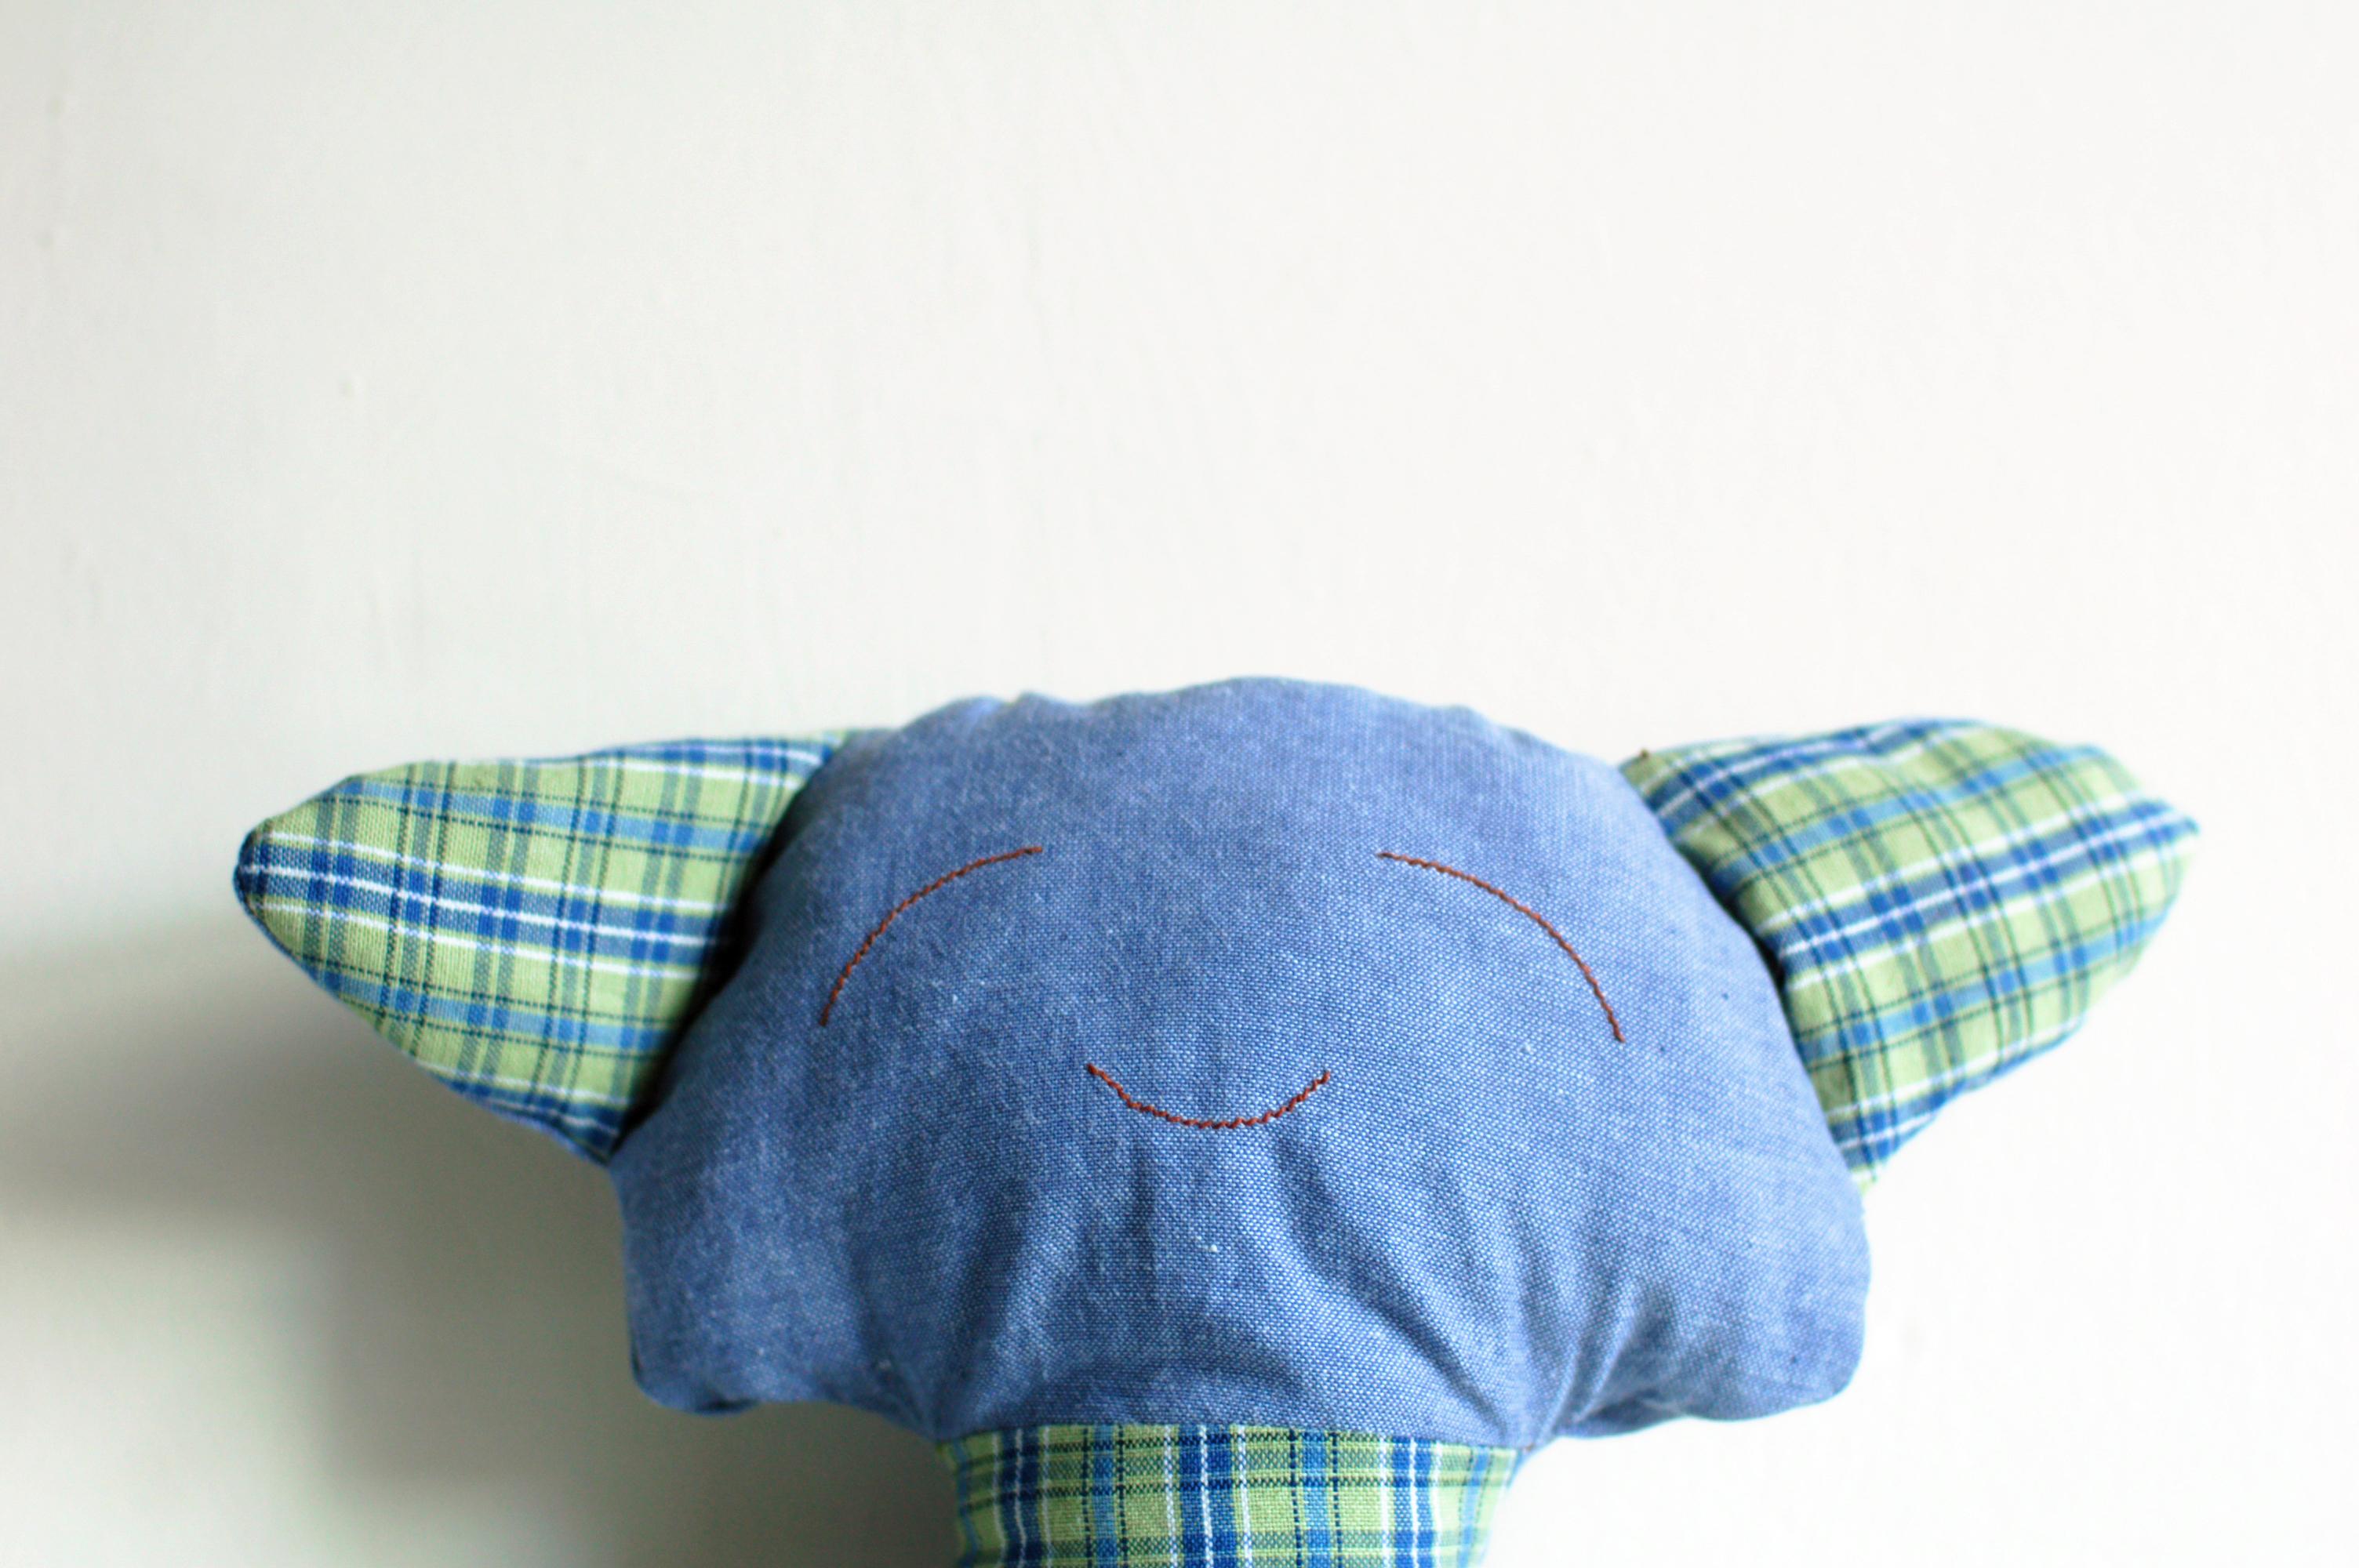 Pachi the stuffed kitten